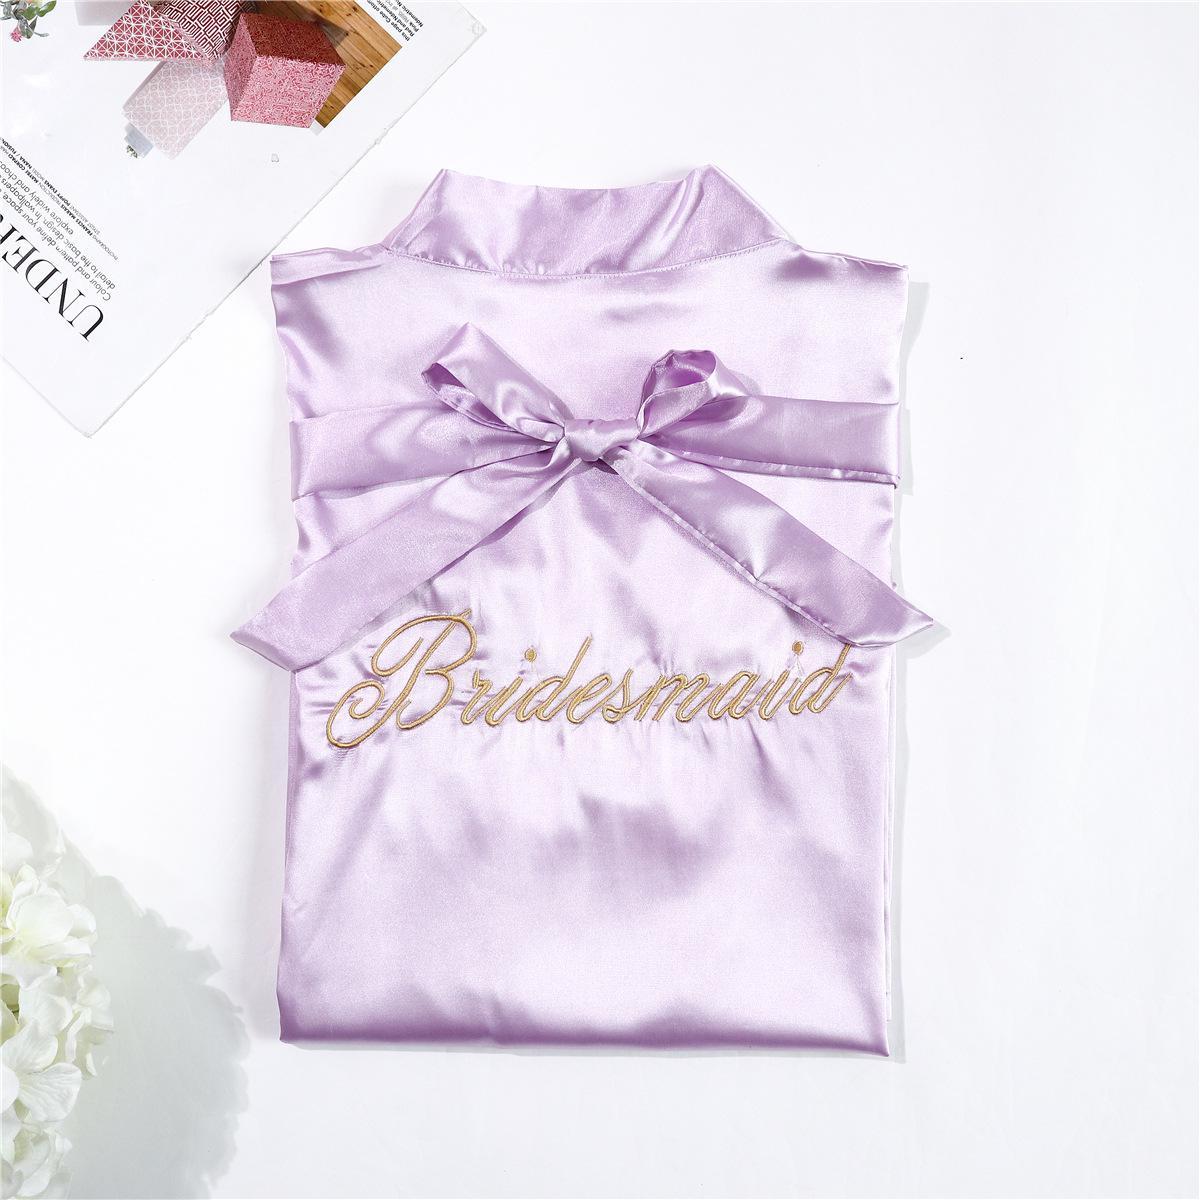 Bridesmaid - 7